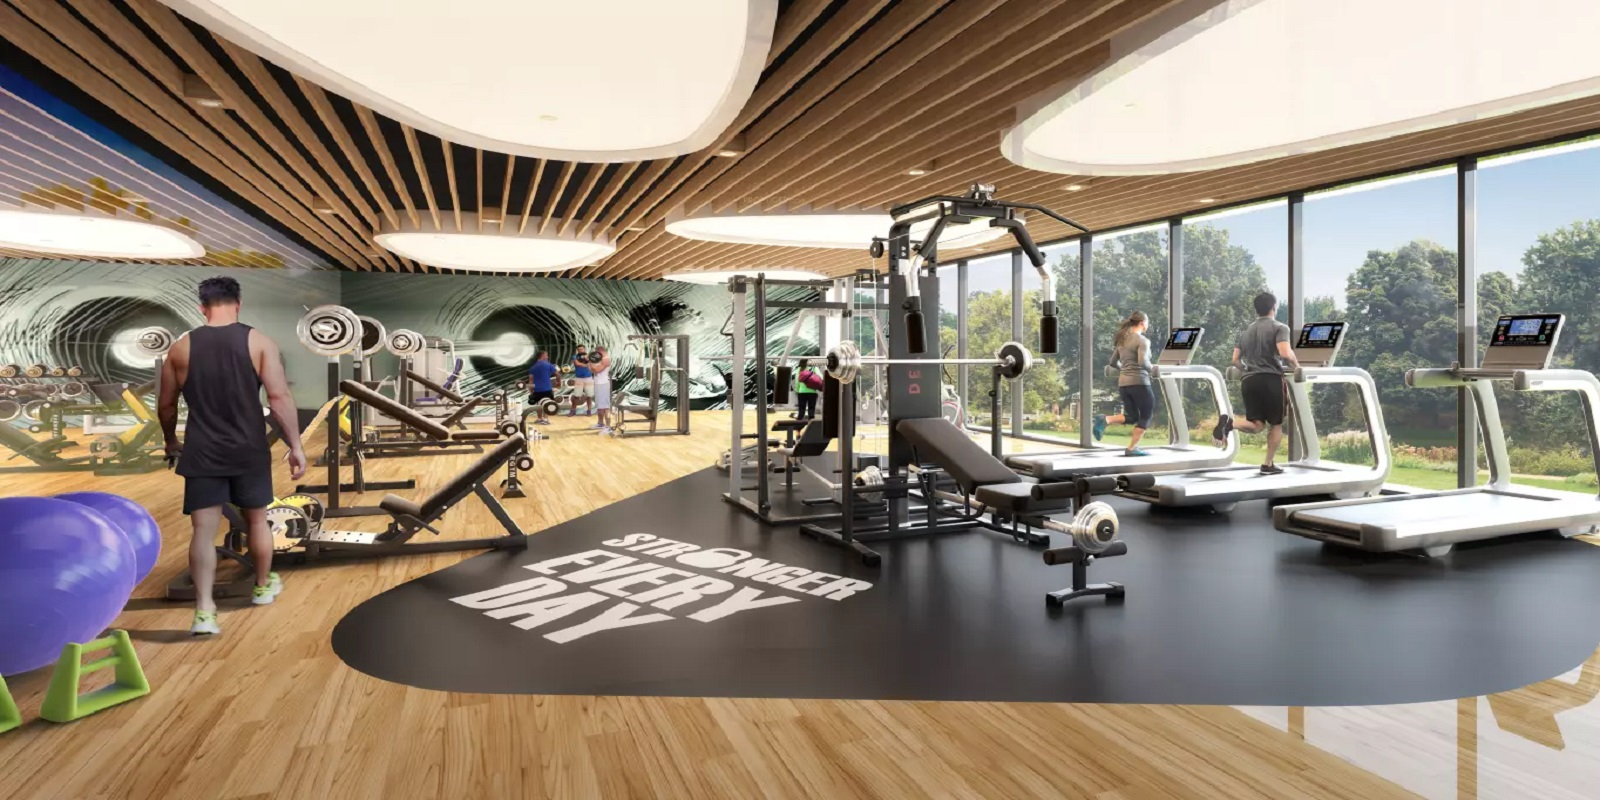 lodha anjur upper thane amenities features10